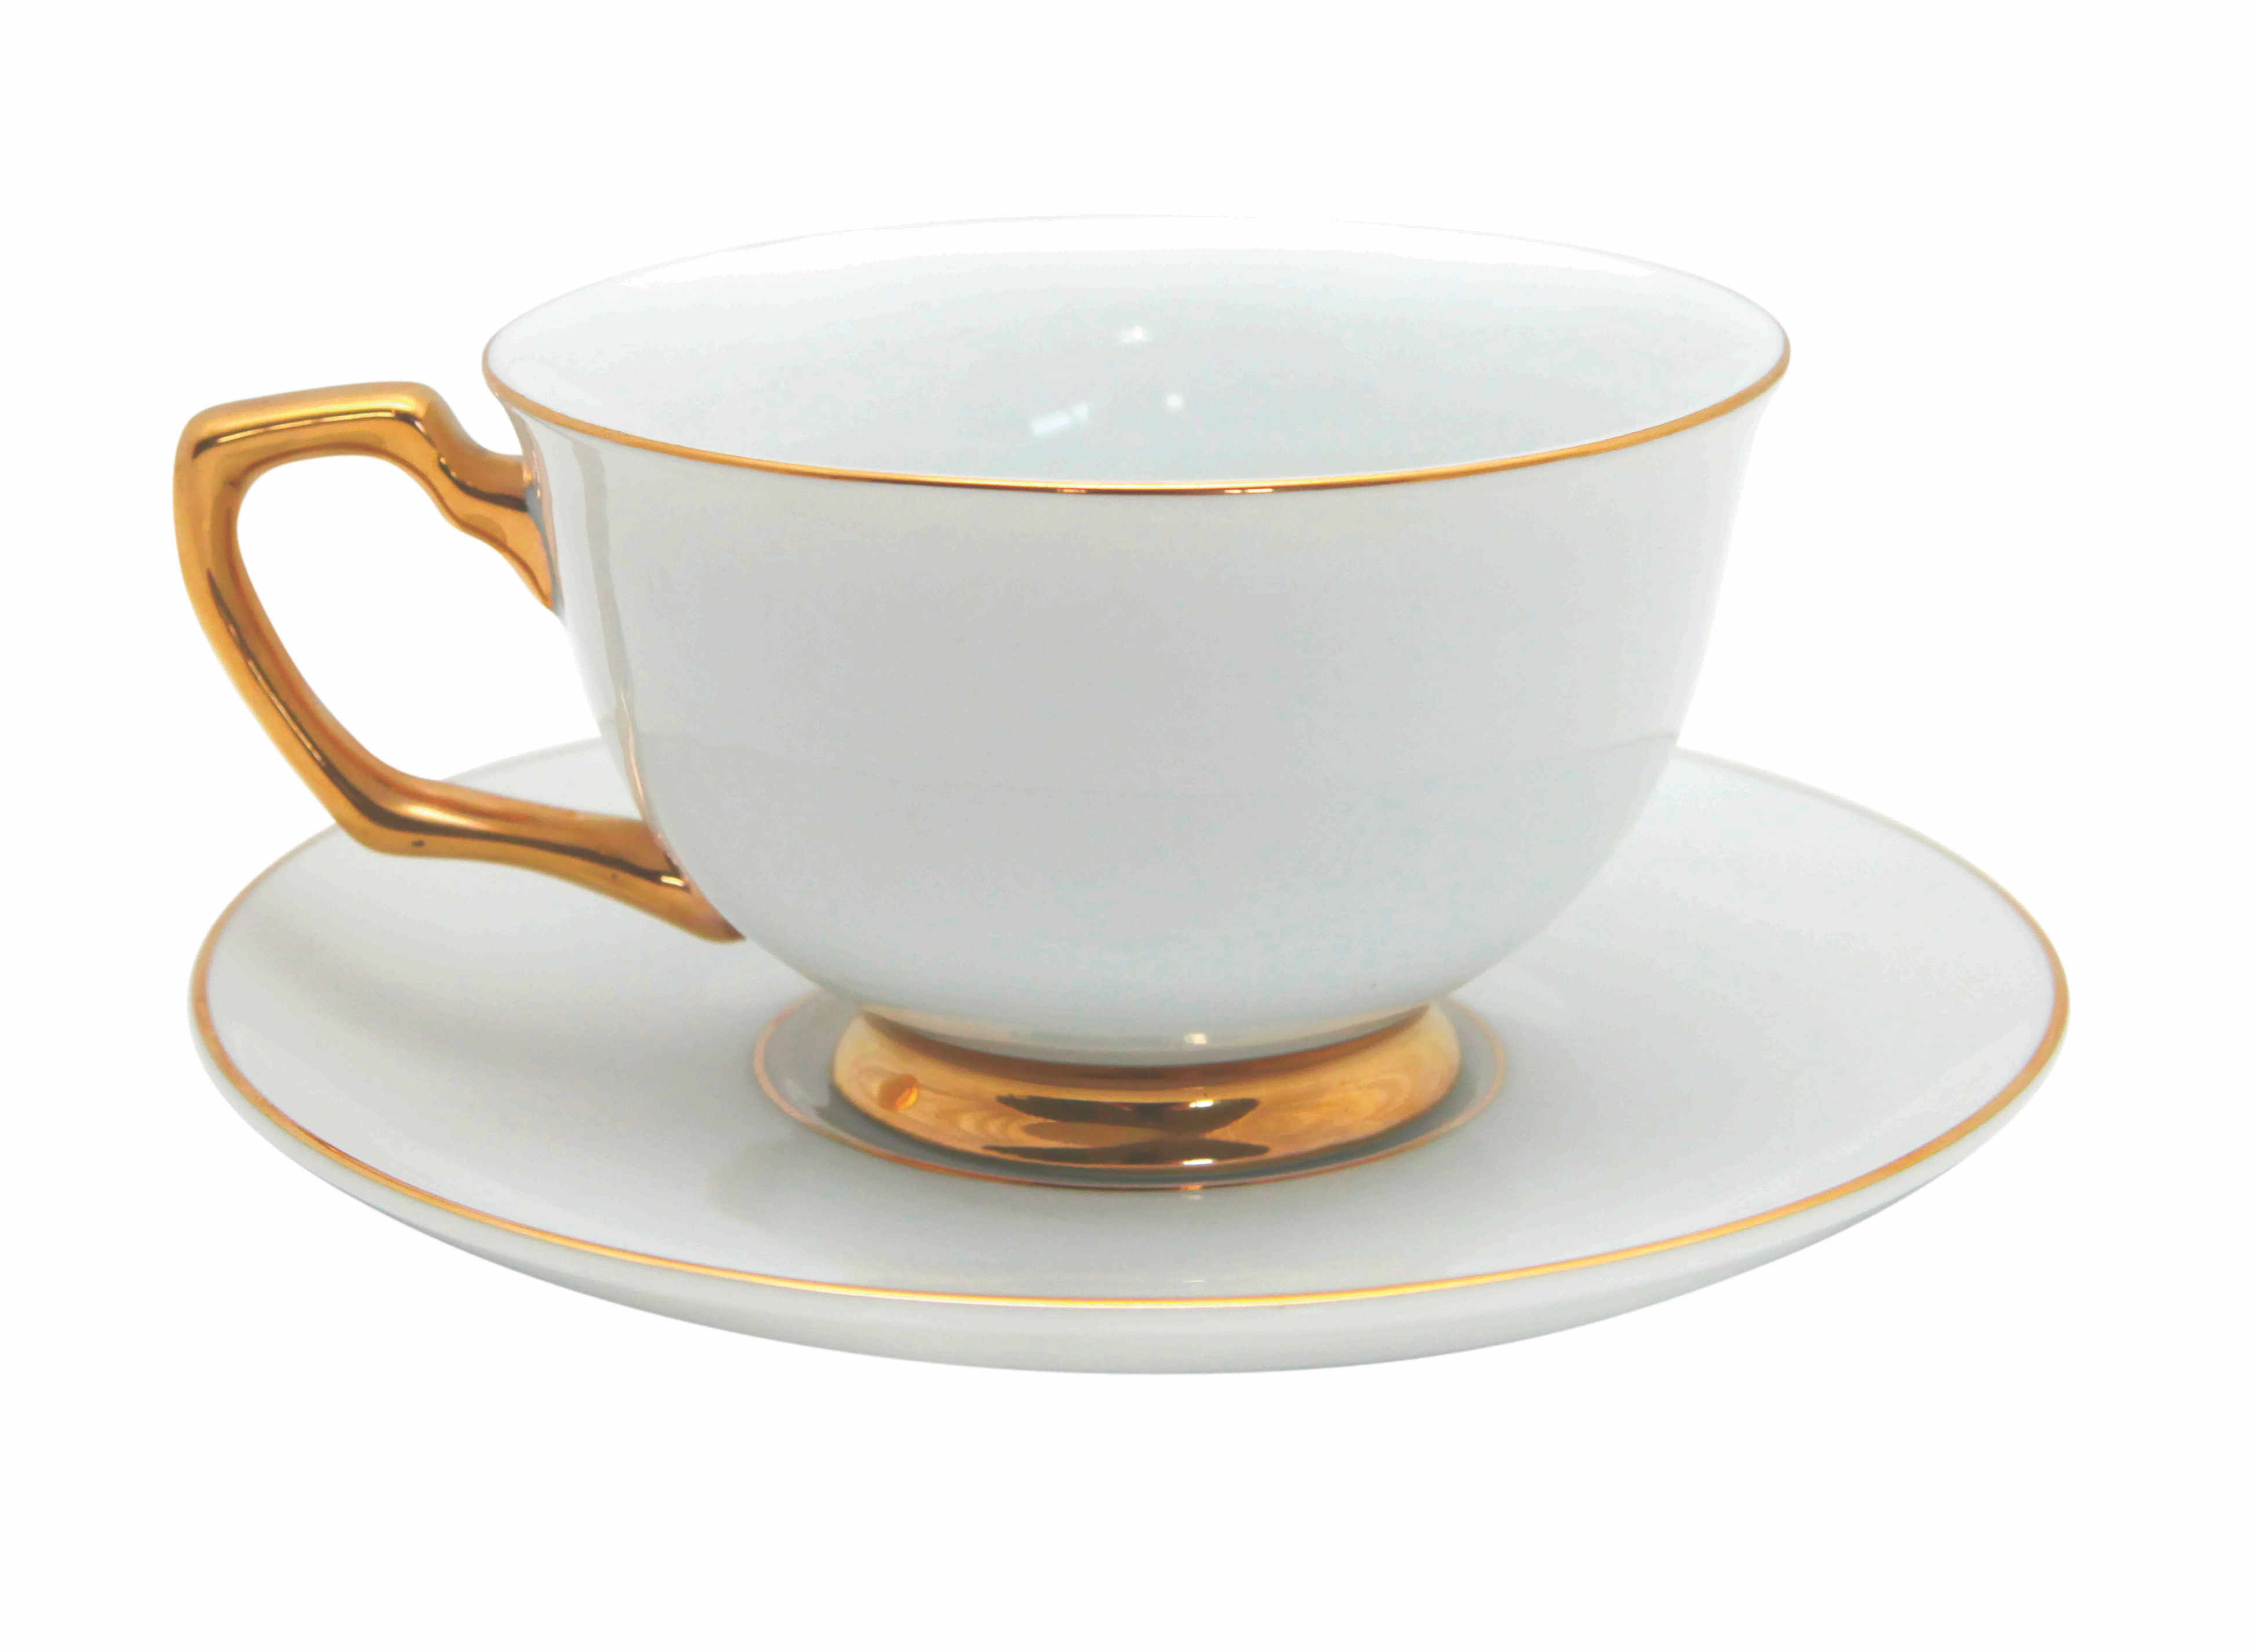 PNG Tea Cup And Saucer - 59064